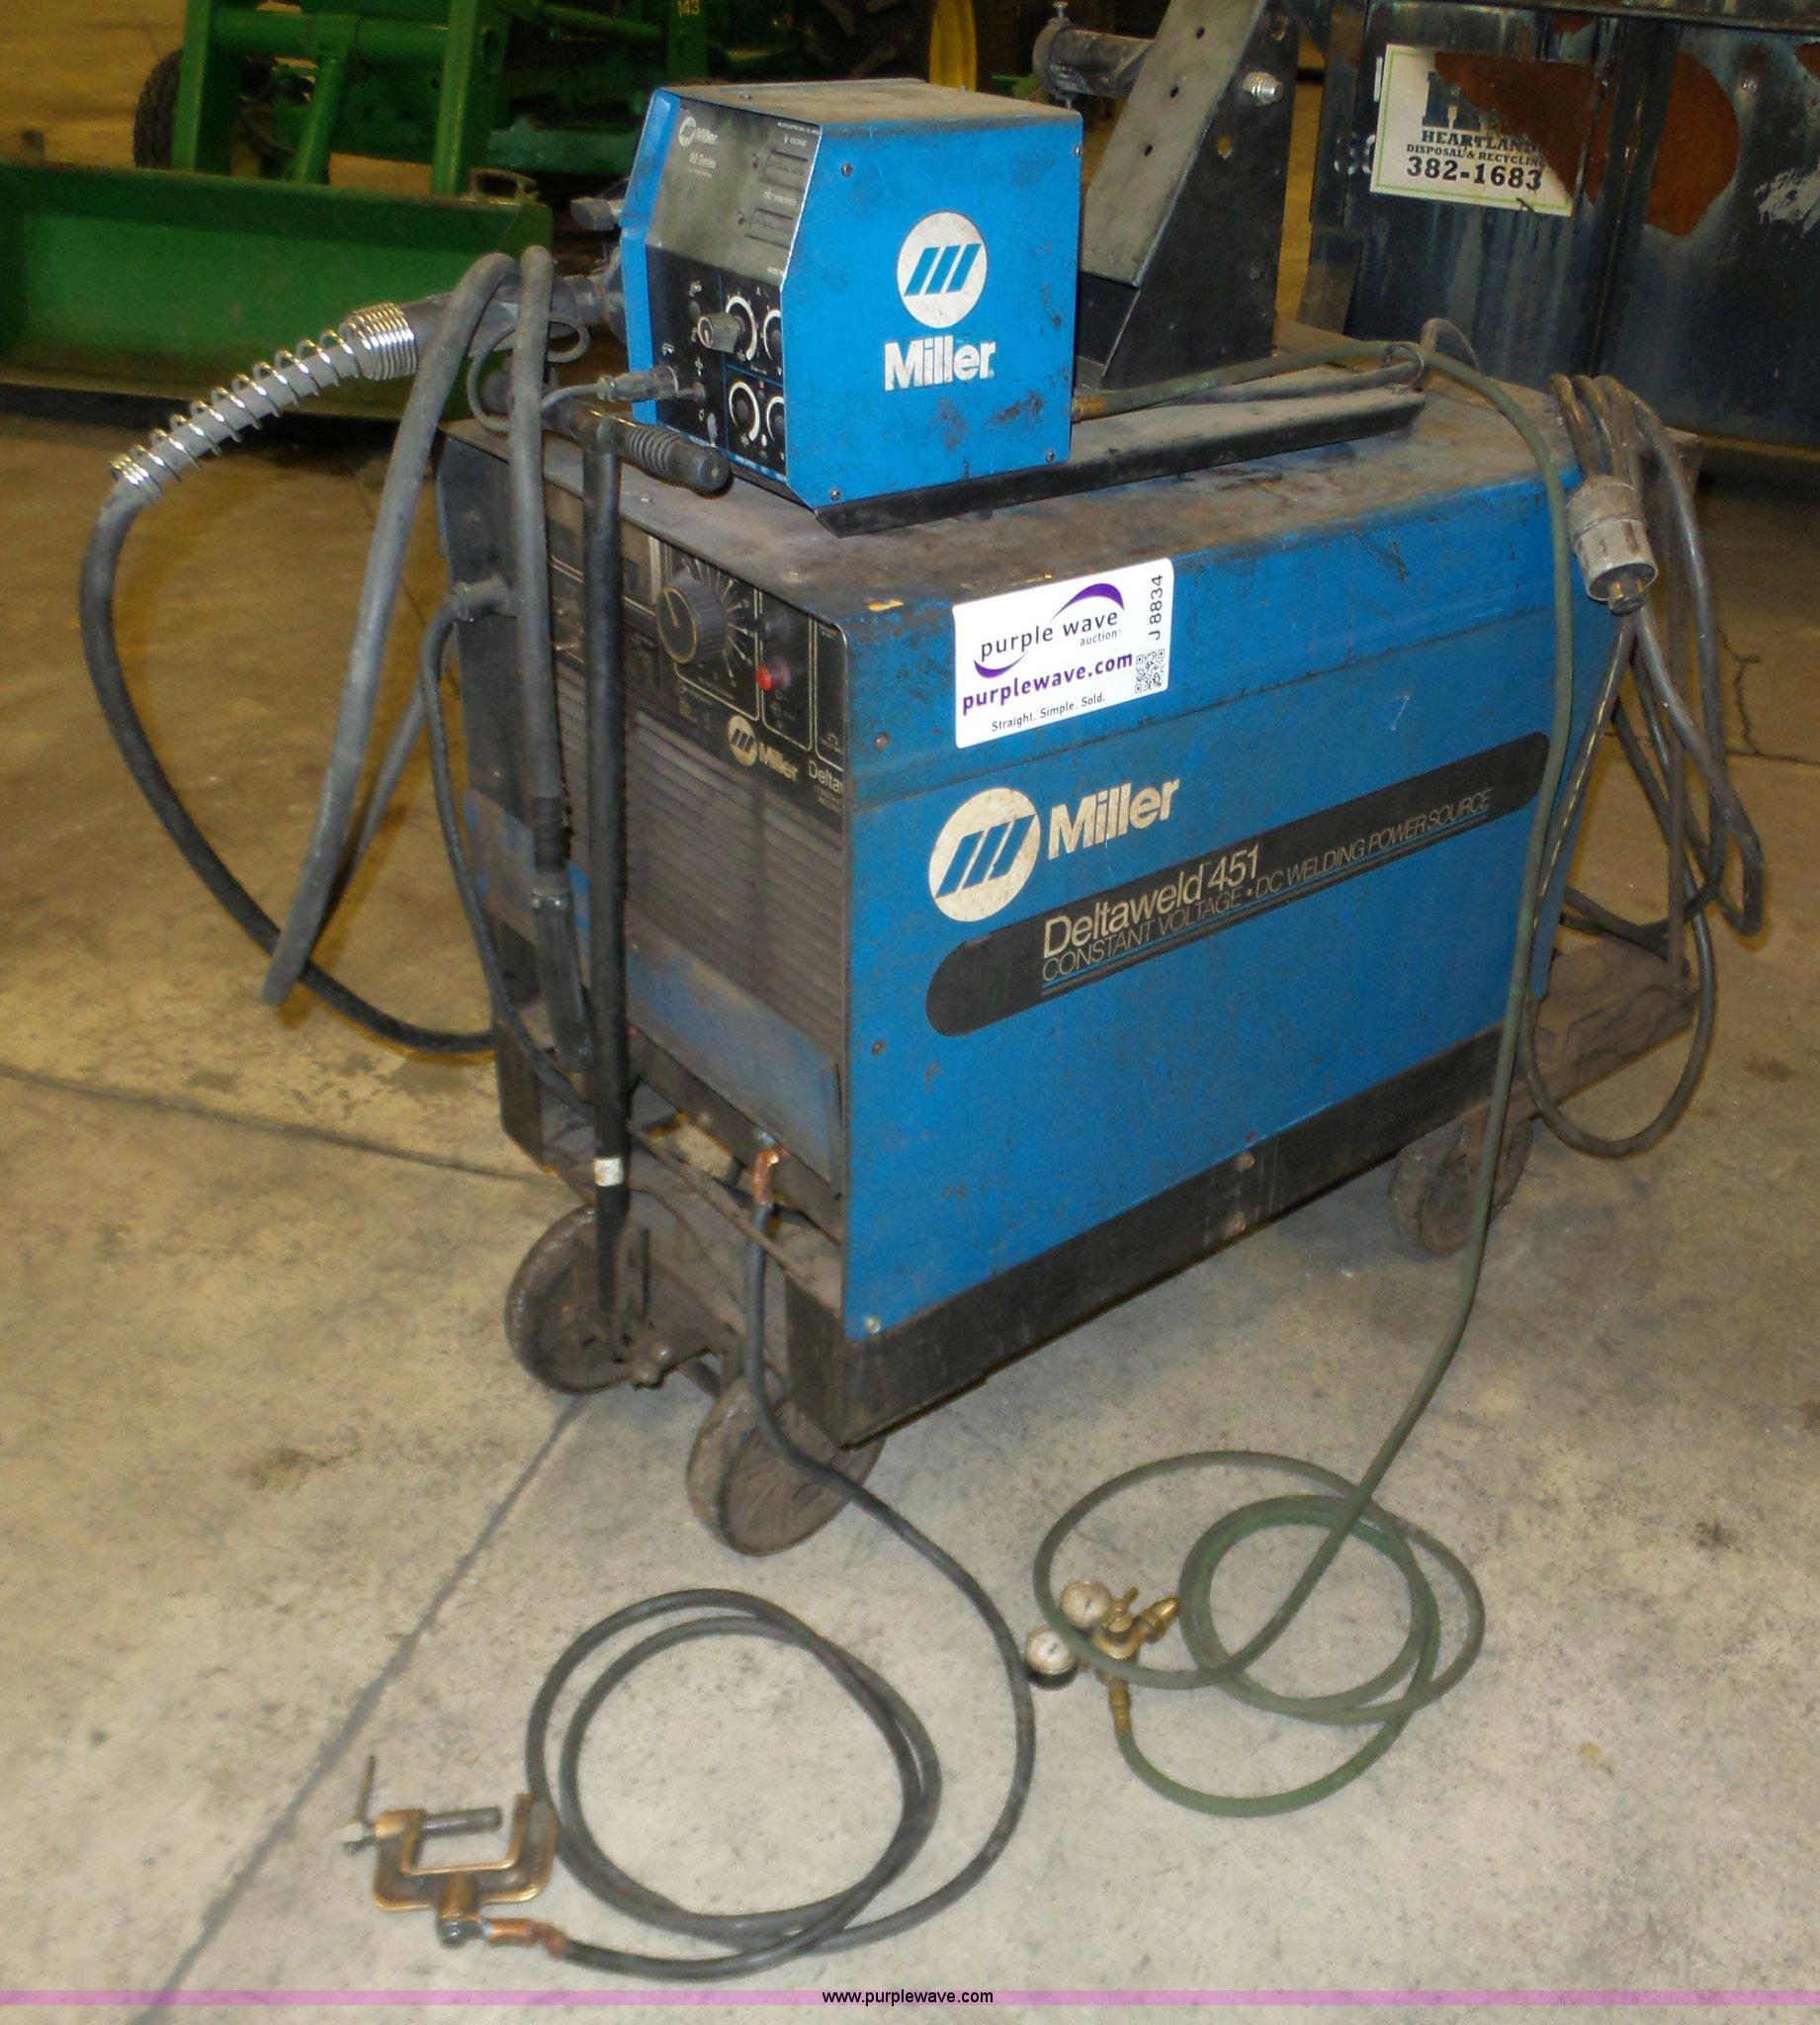 Miller Deltaweld 451 wire feed welder | Item J8834 | SOLD! M...